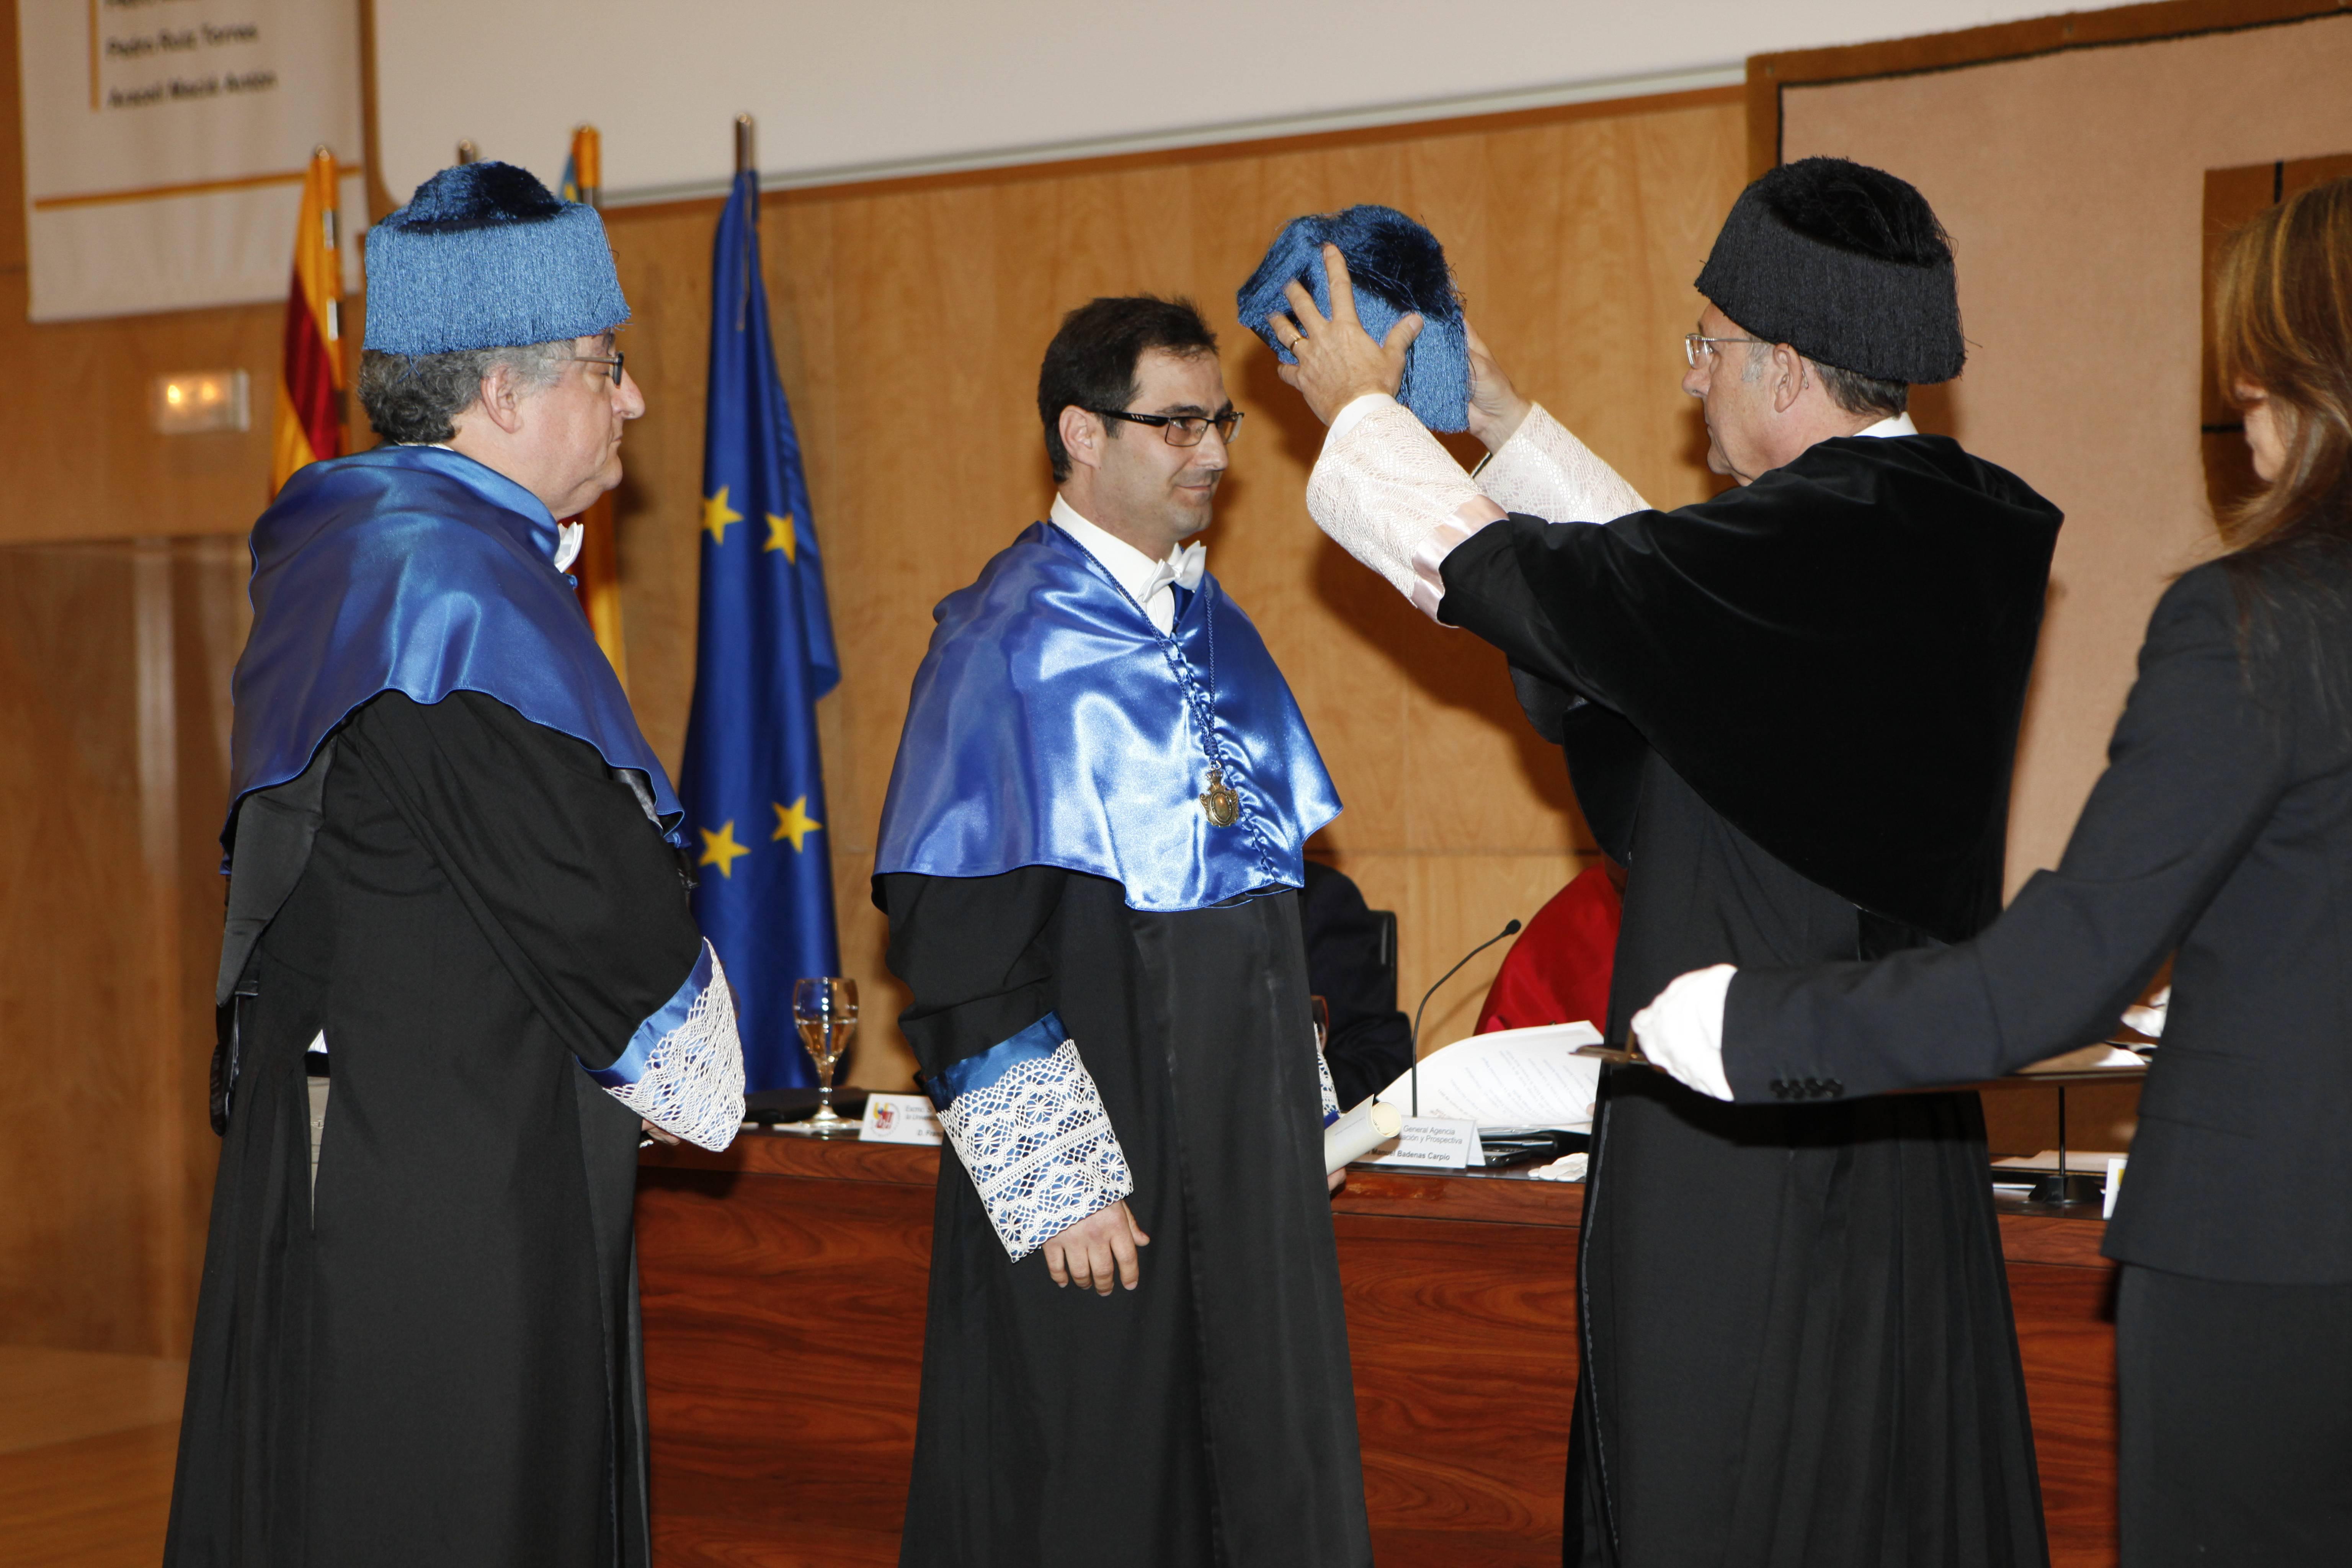 doctor-honoris-causa-luis-gamir_mg_1136.jpg